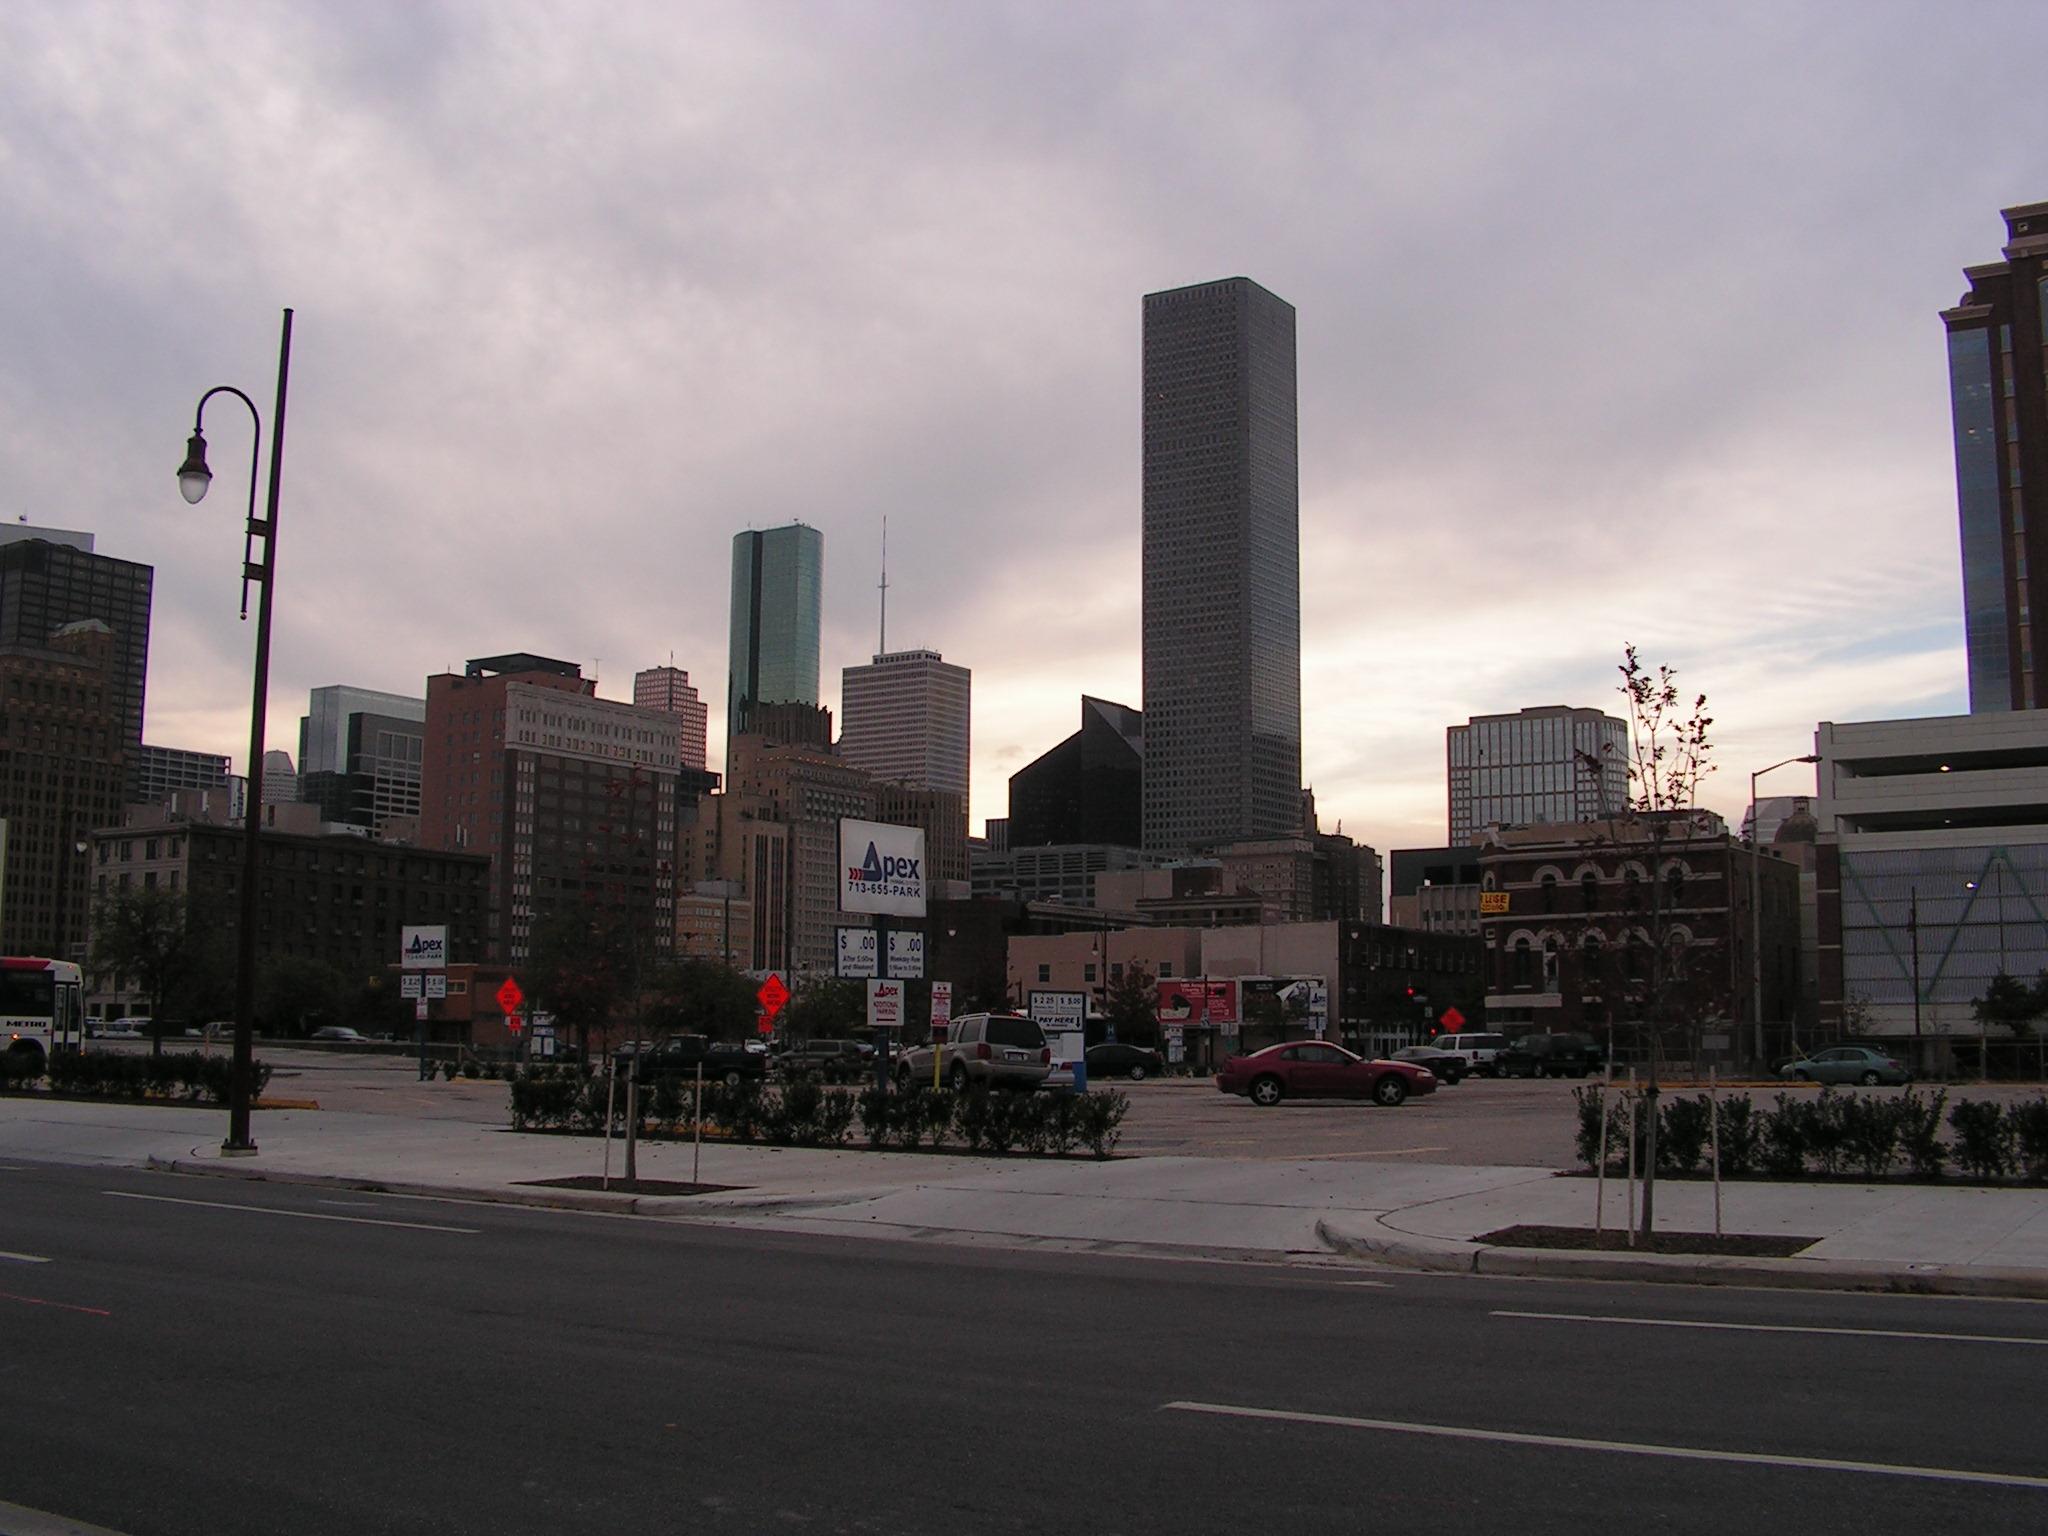 Jpmc Houston Parking - More info